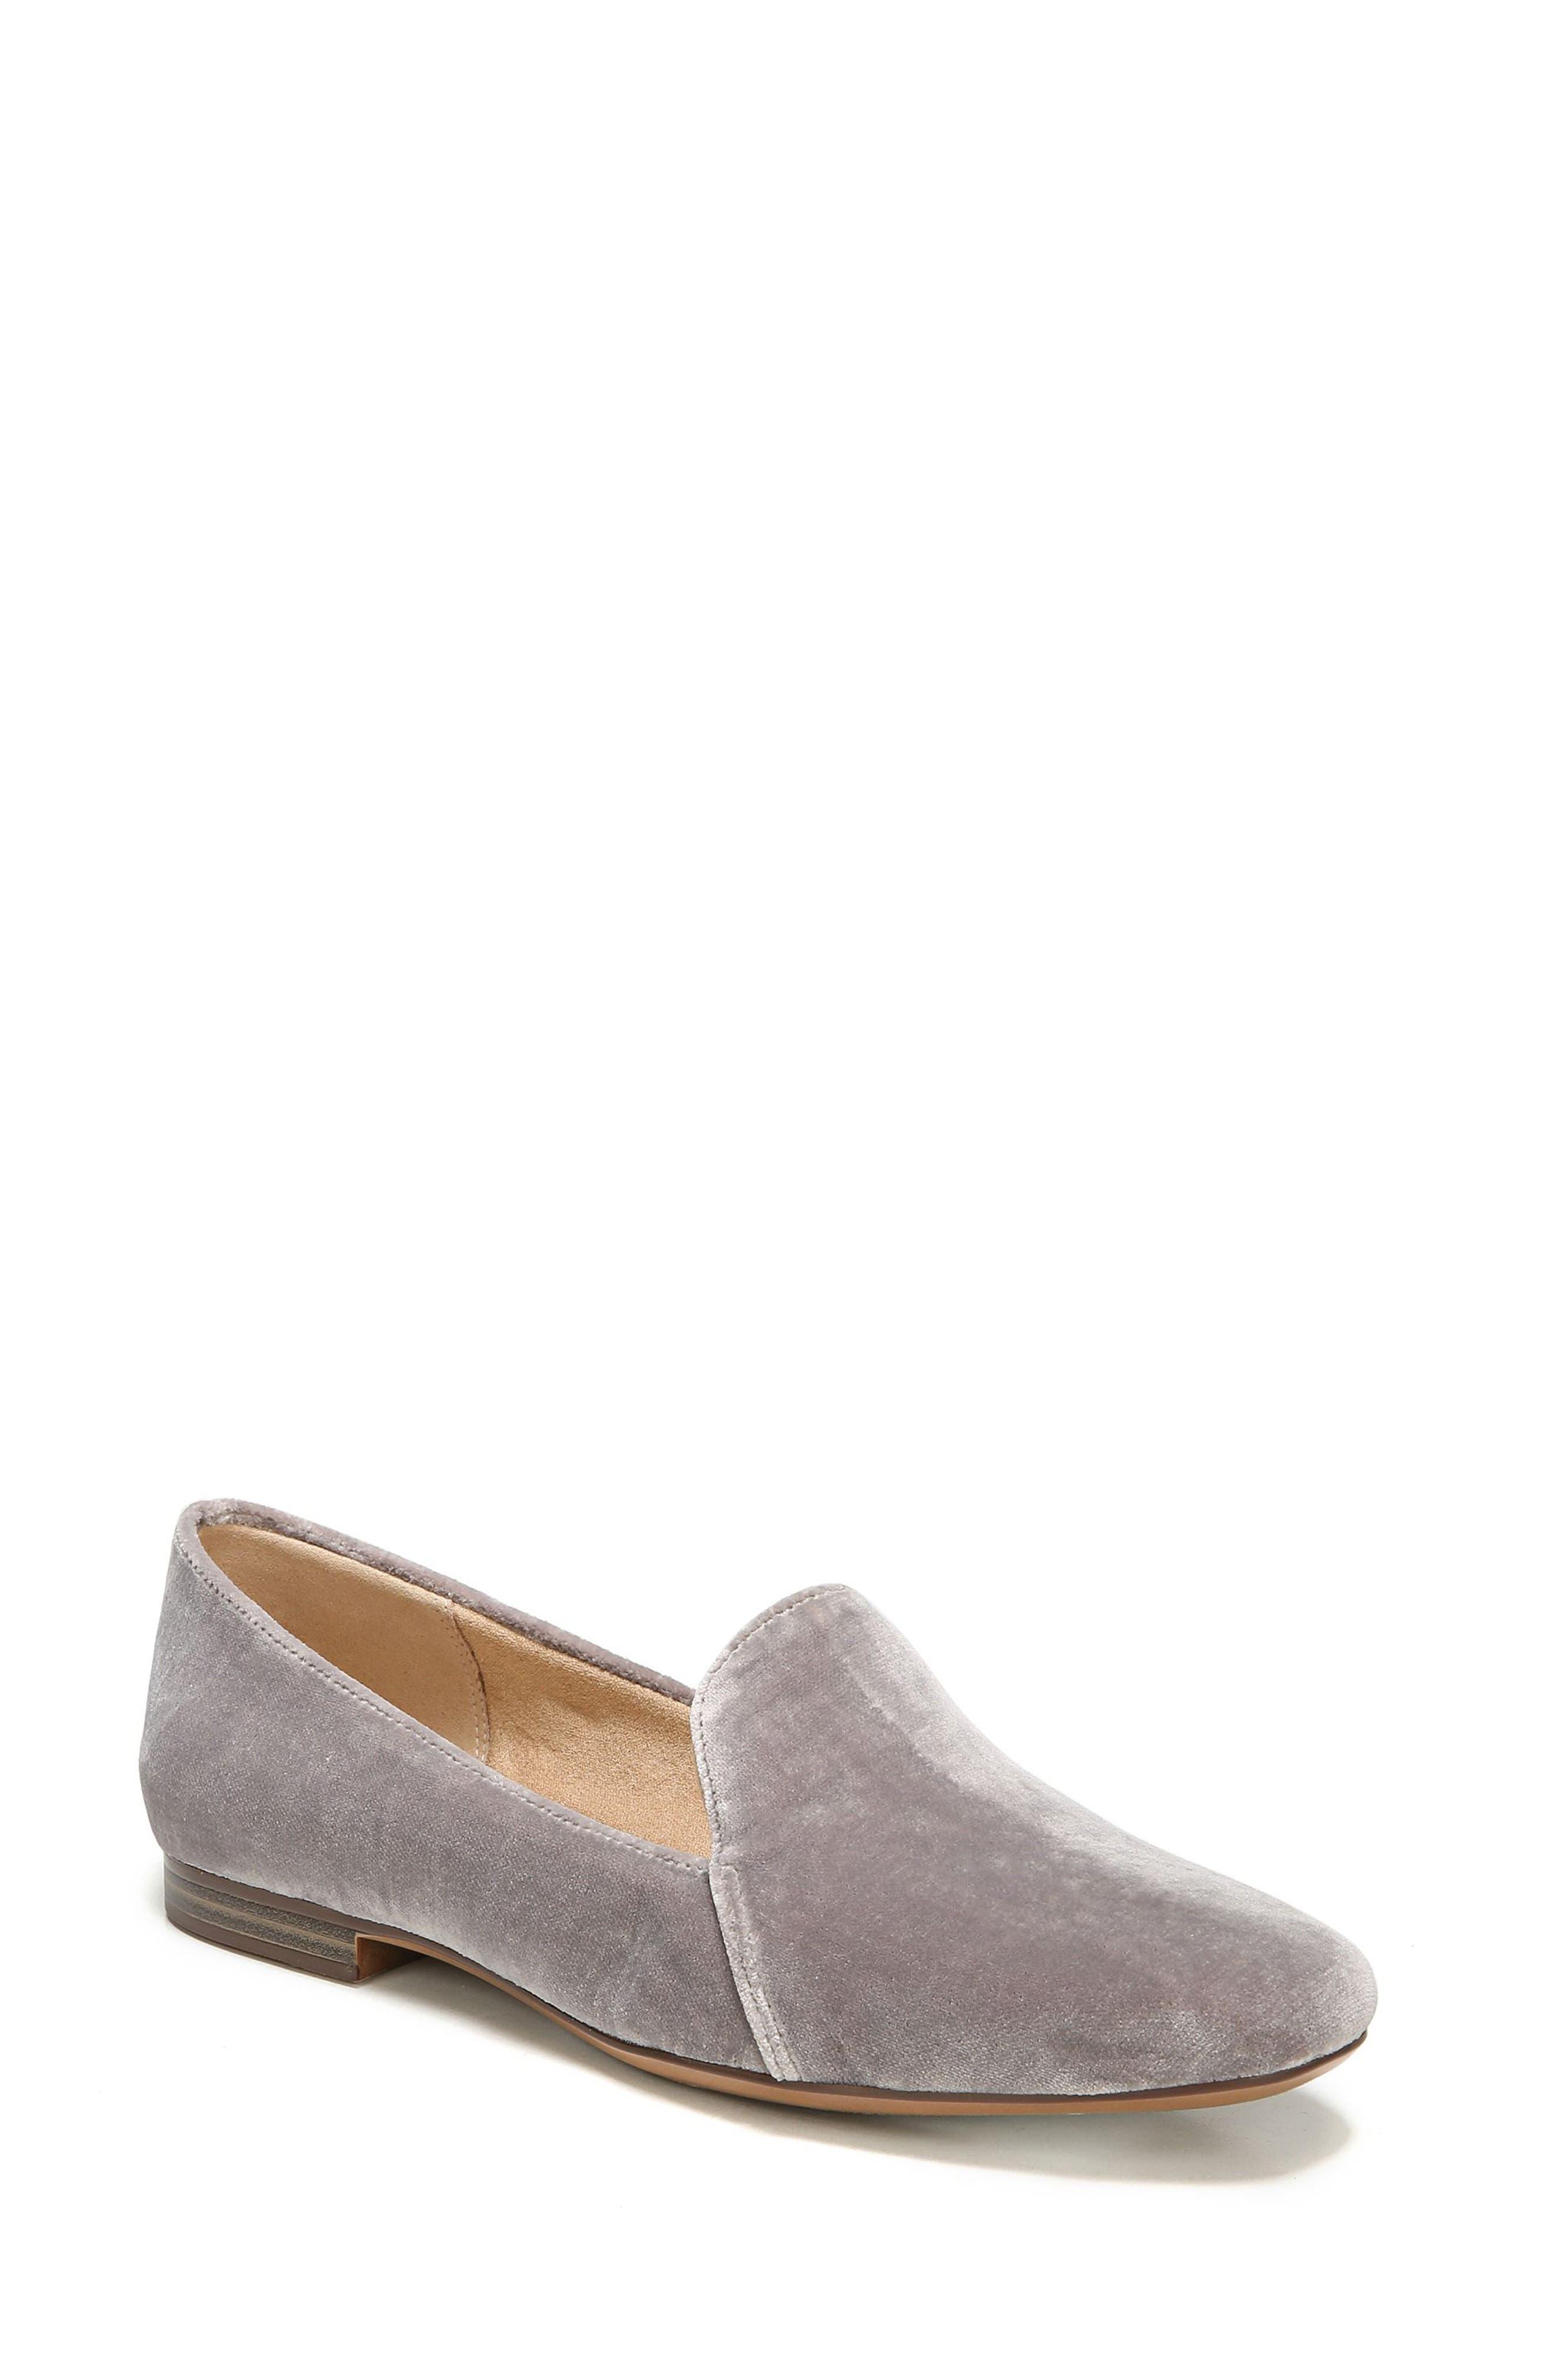 Emiline Flat Loafer,                         Main,                         color, Taupe Velvet Fabric